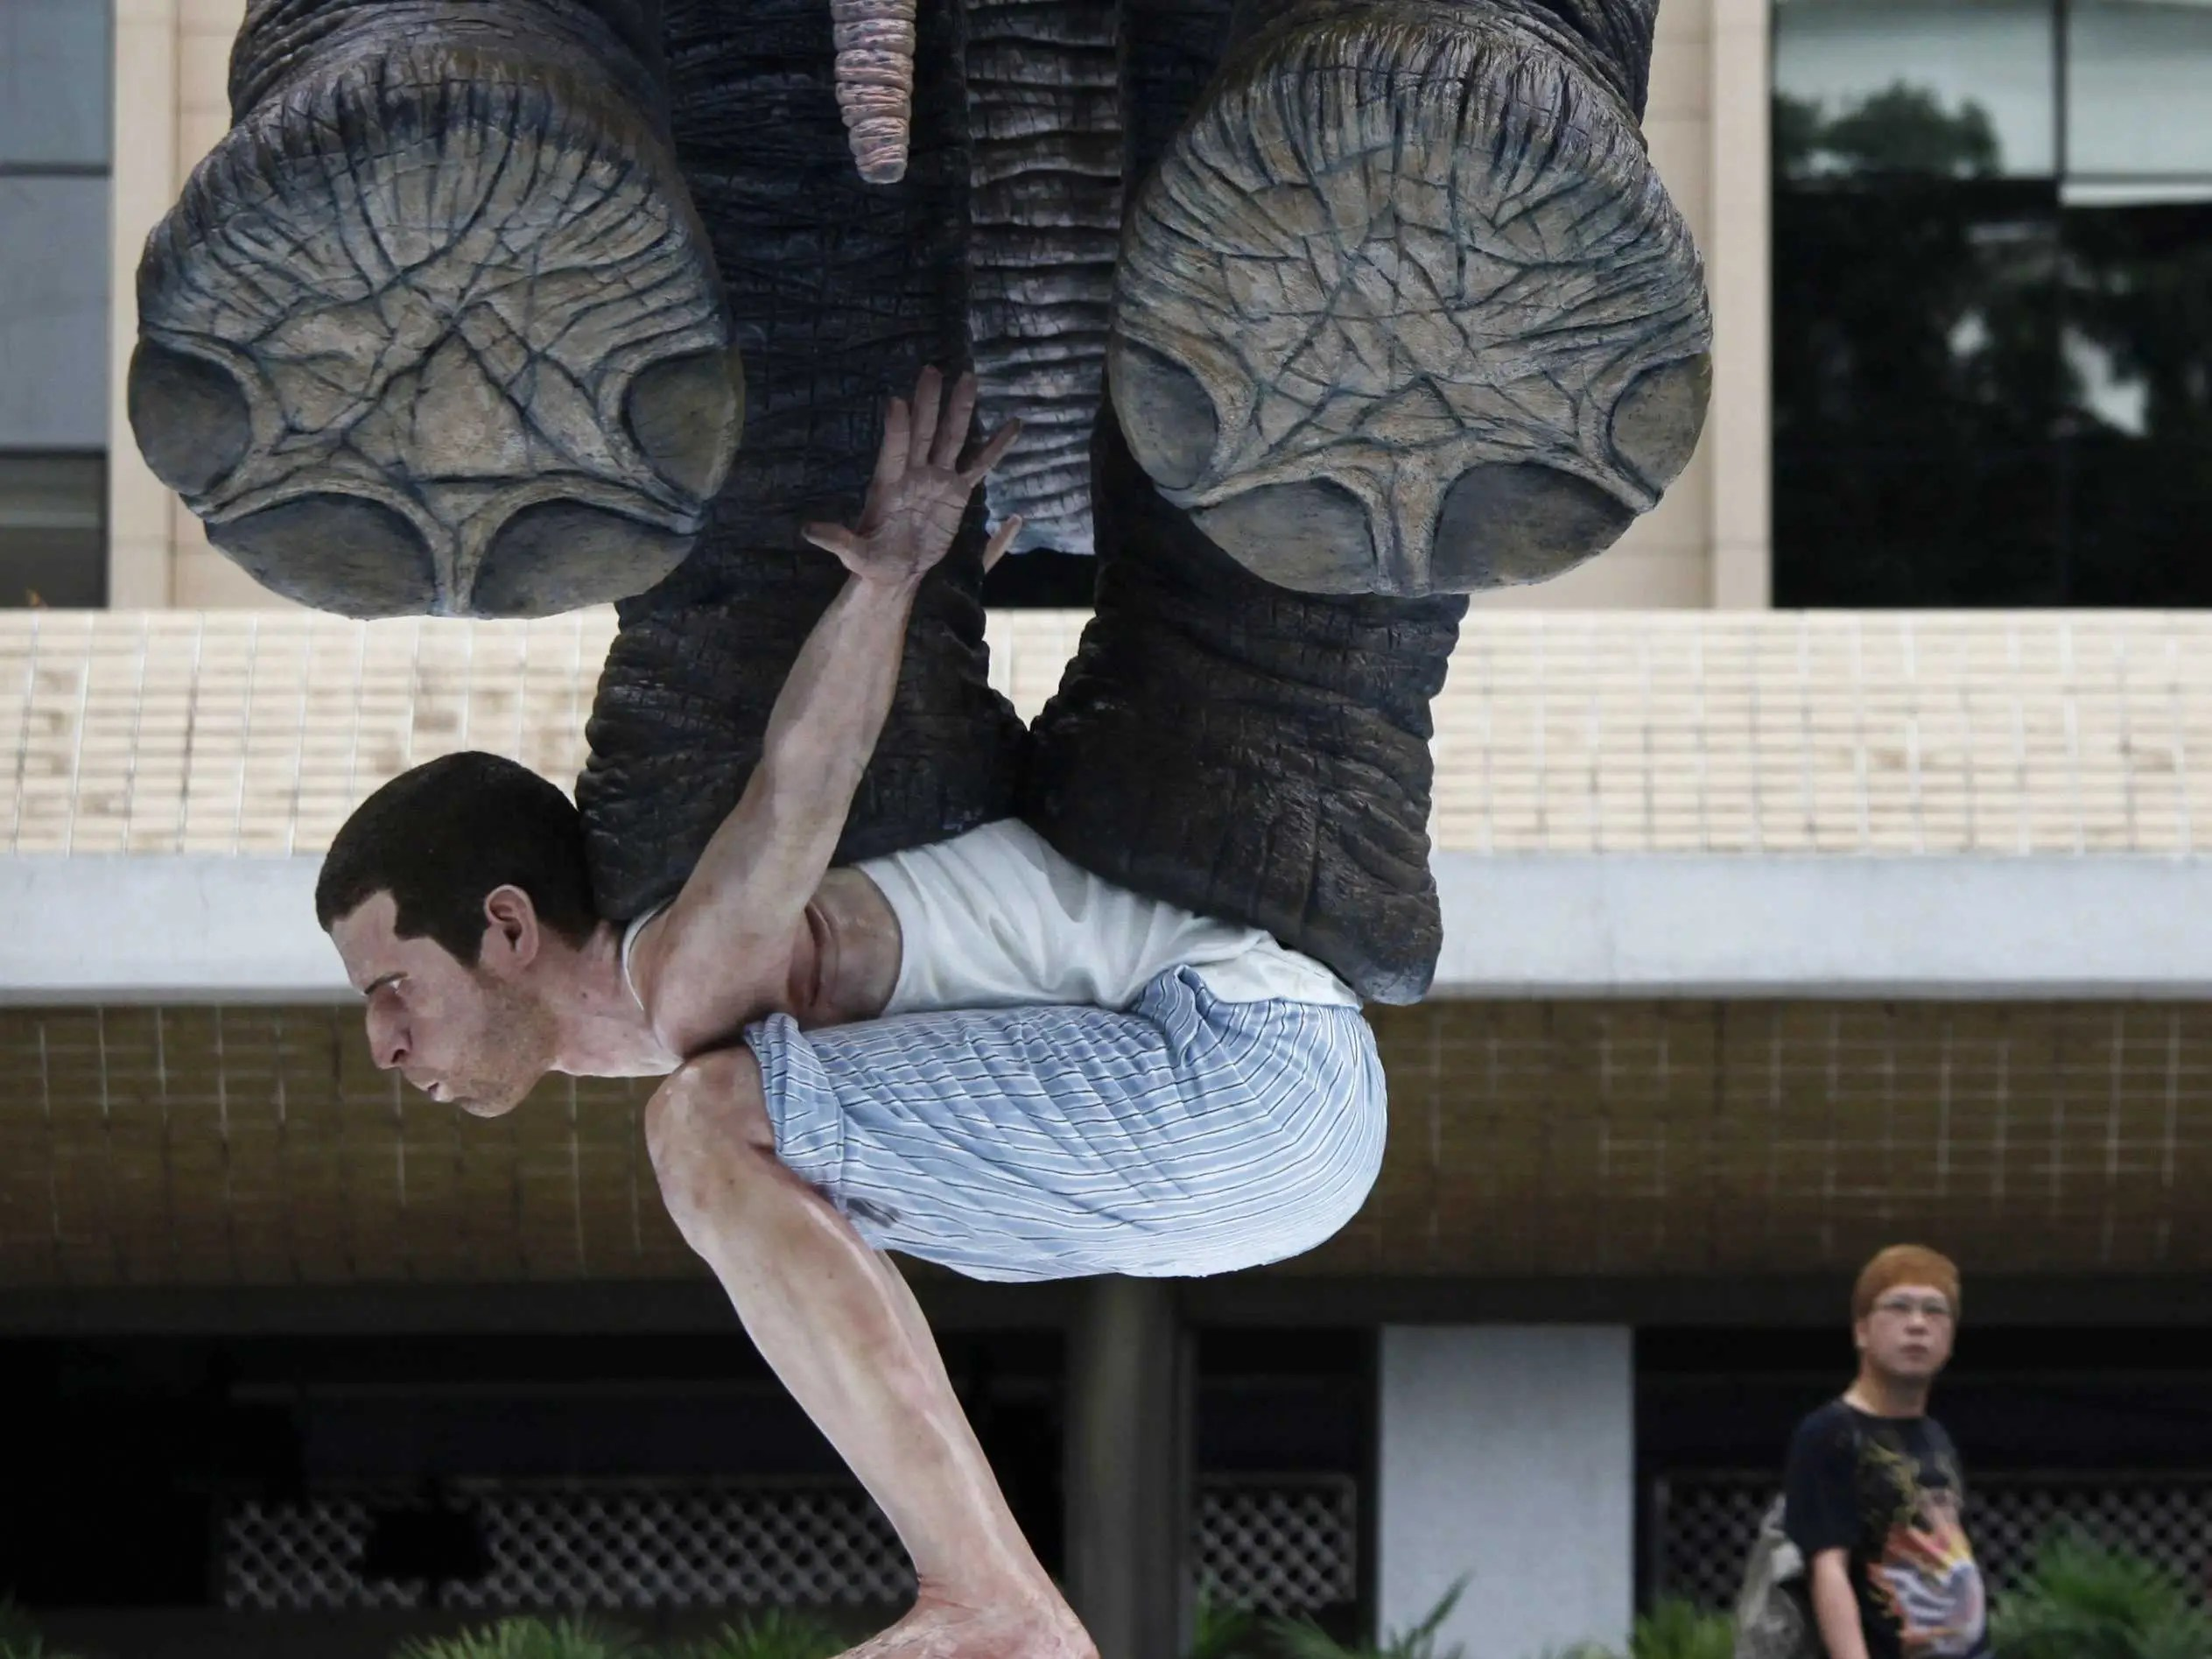 estatua de elefante